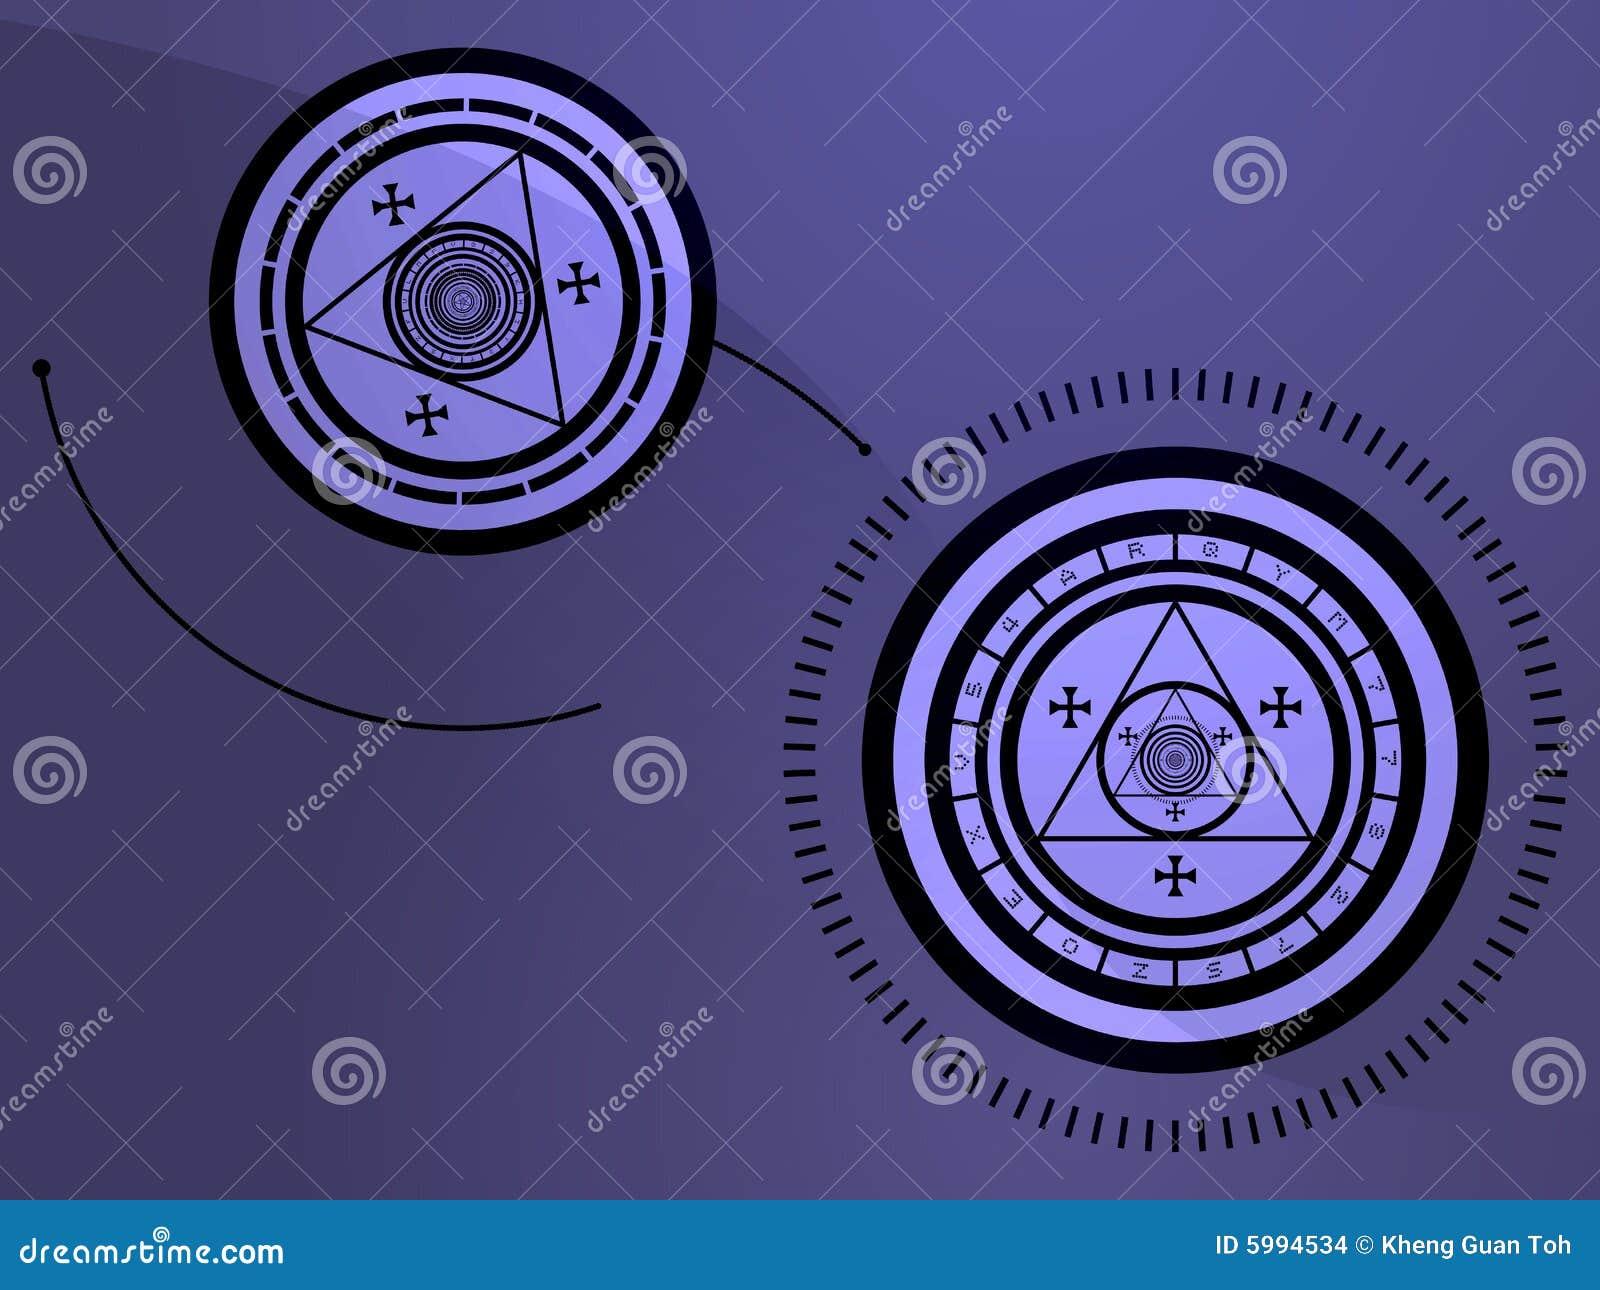 occult symbols stock illustration illustration of magic